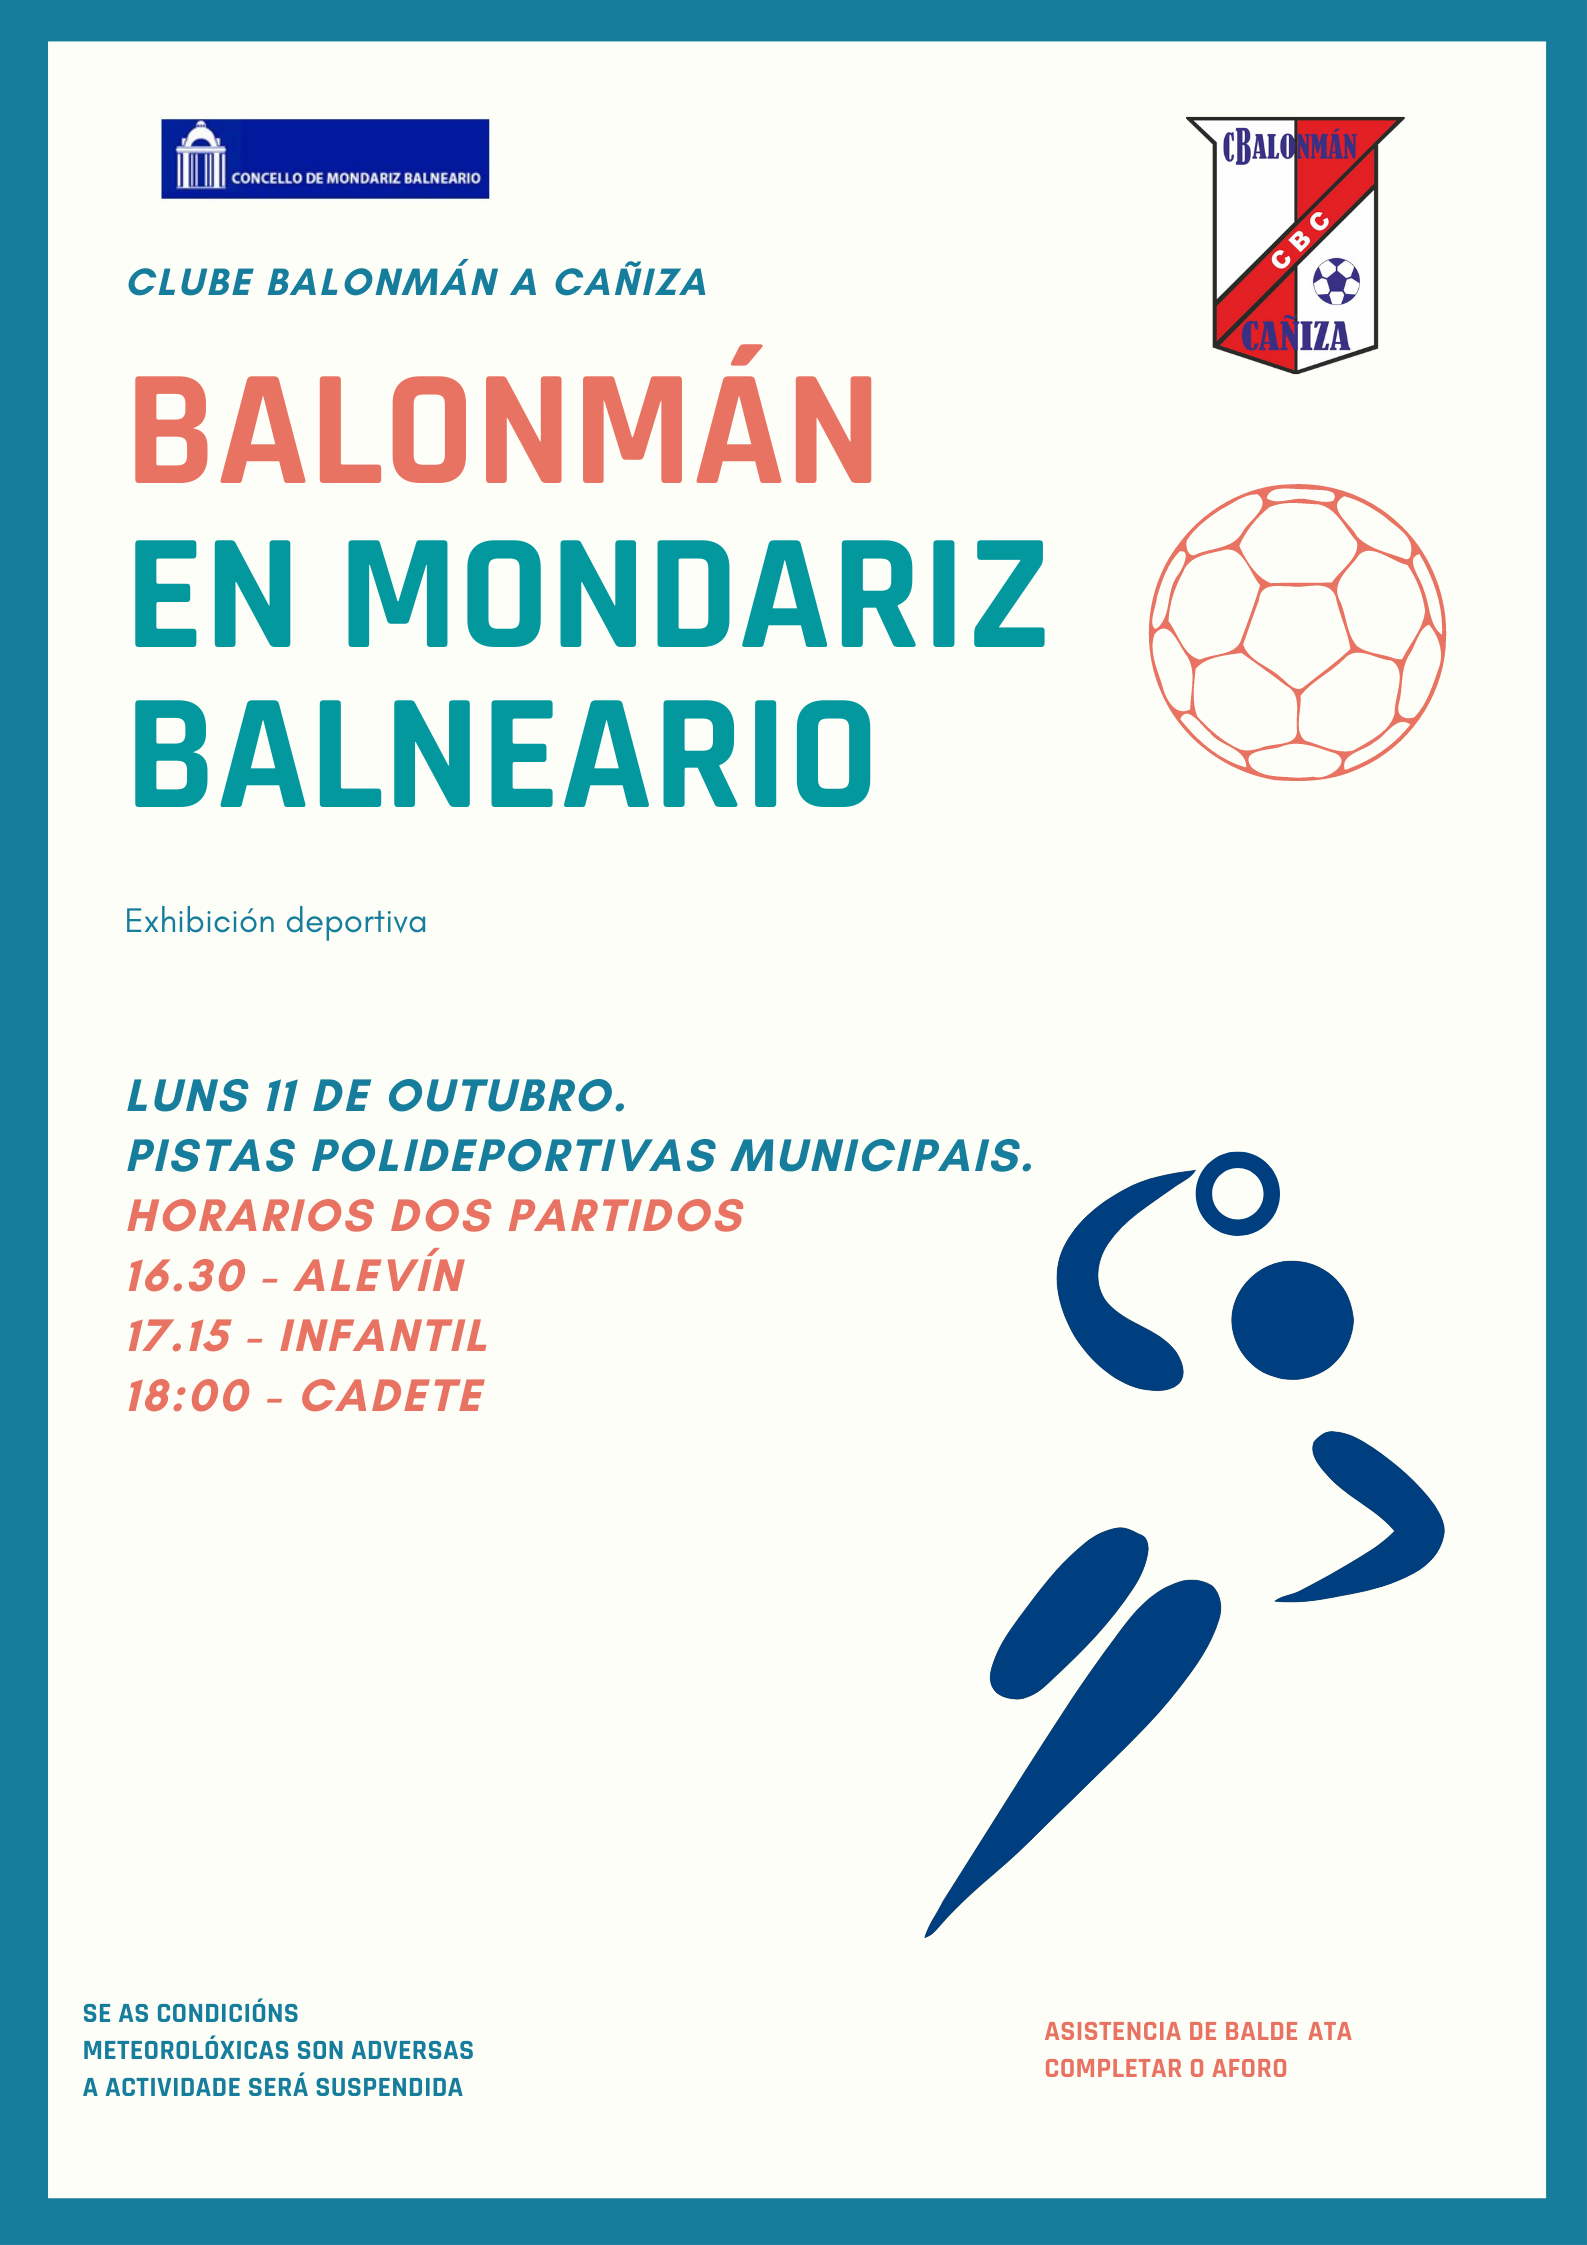 BALONMAN-MONDARIZBALNEARIO